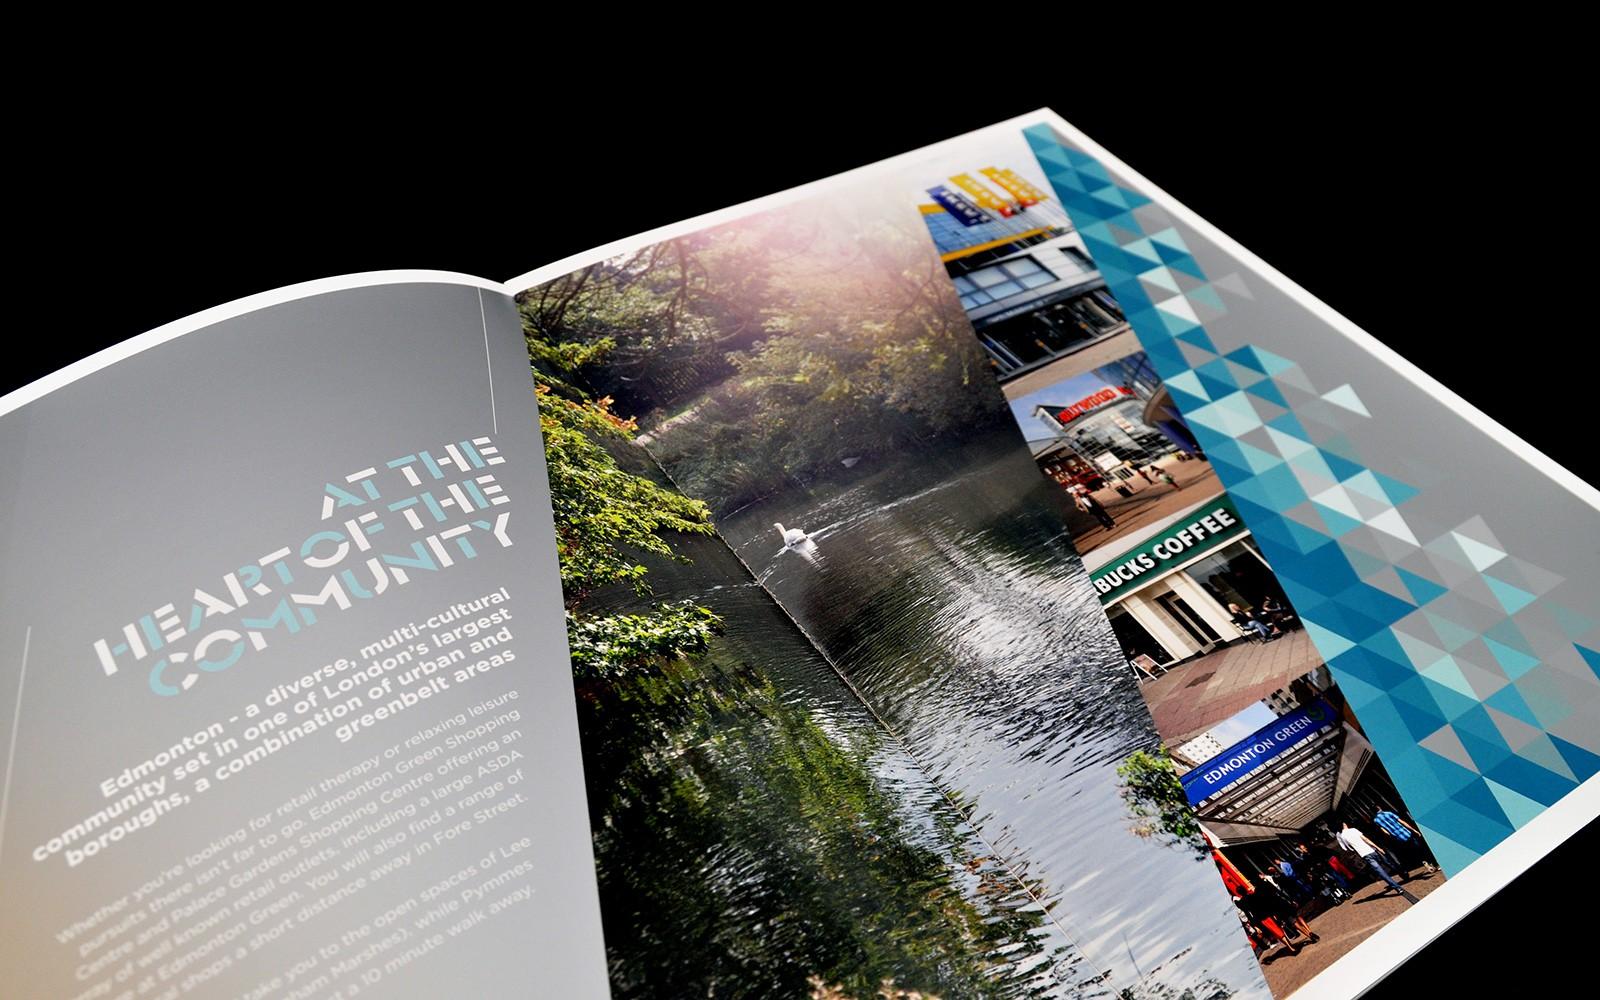 Residential Property brochure spread